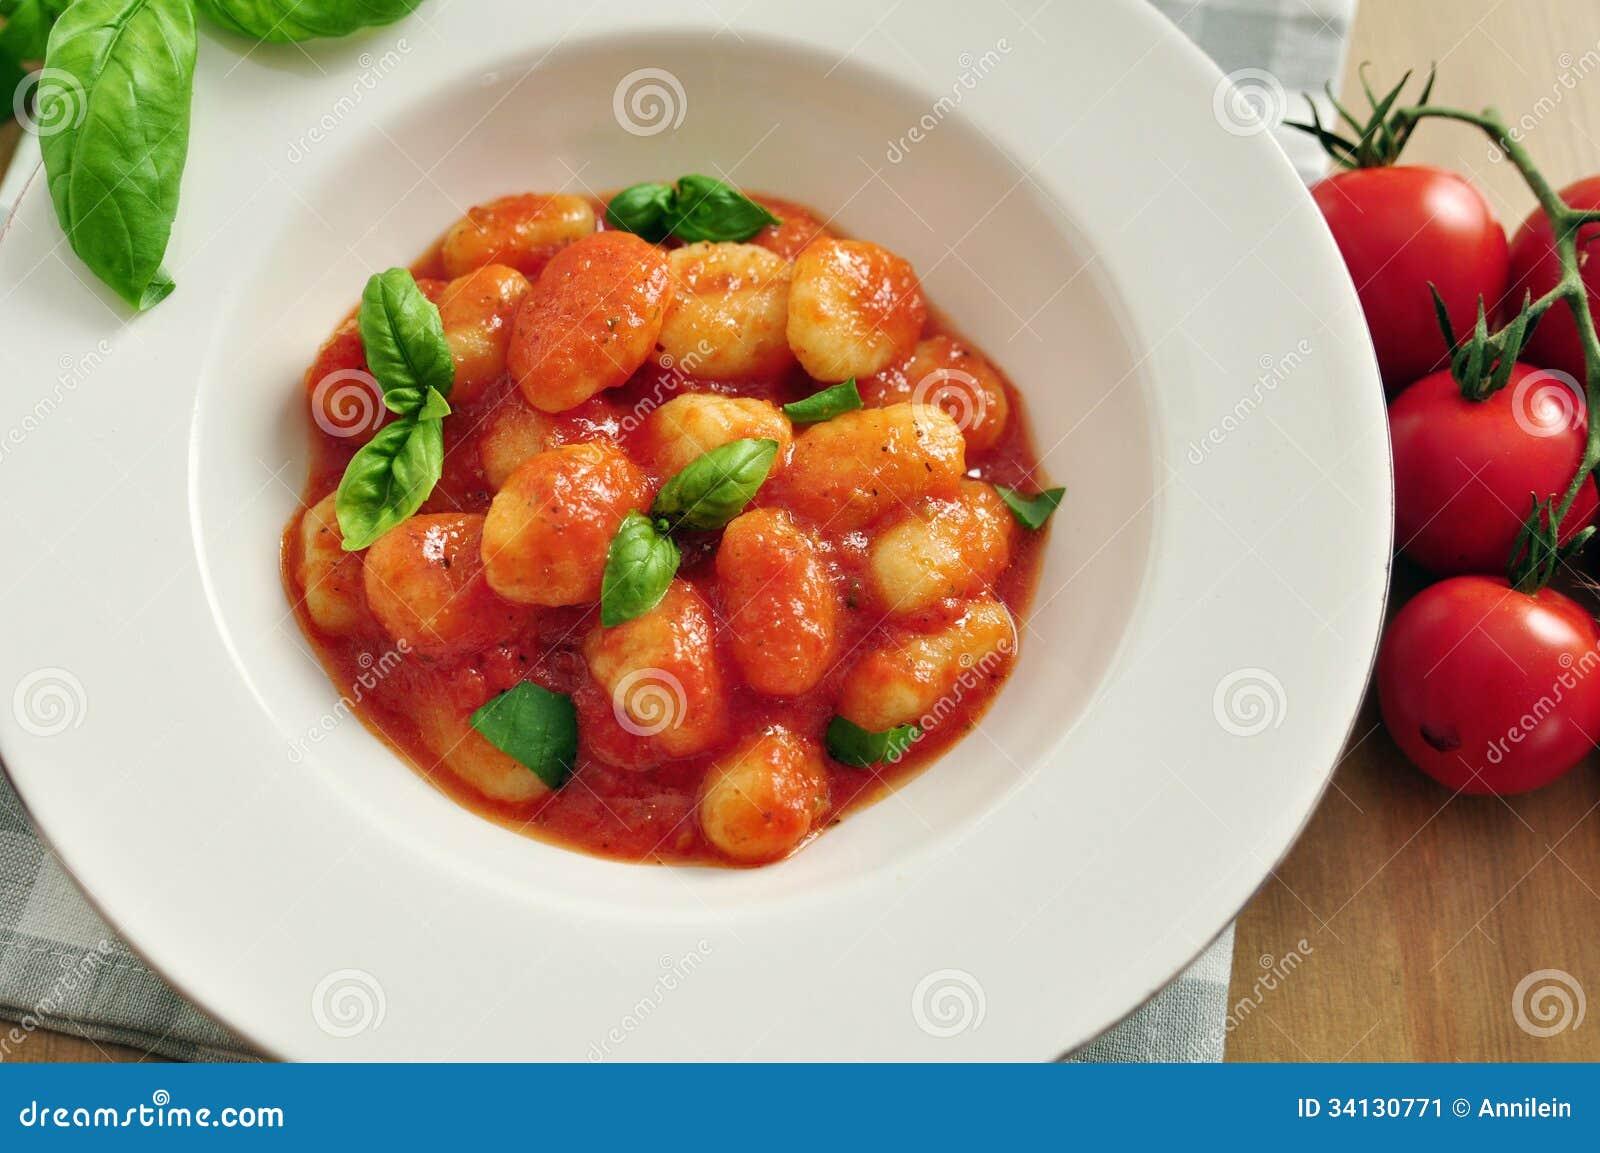 gnocchi with creme fraiche sage sauce gnocchi with tomato sauce ...